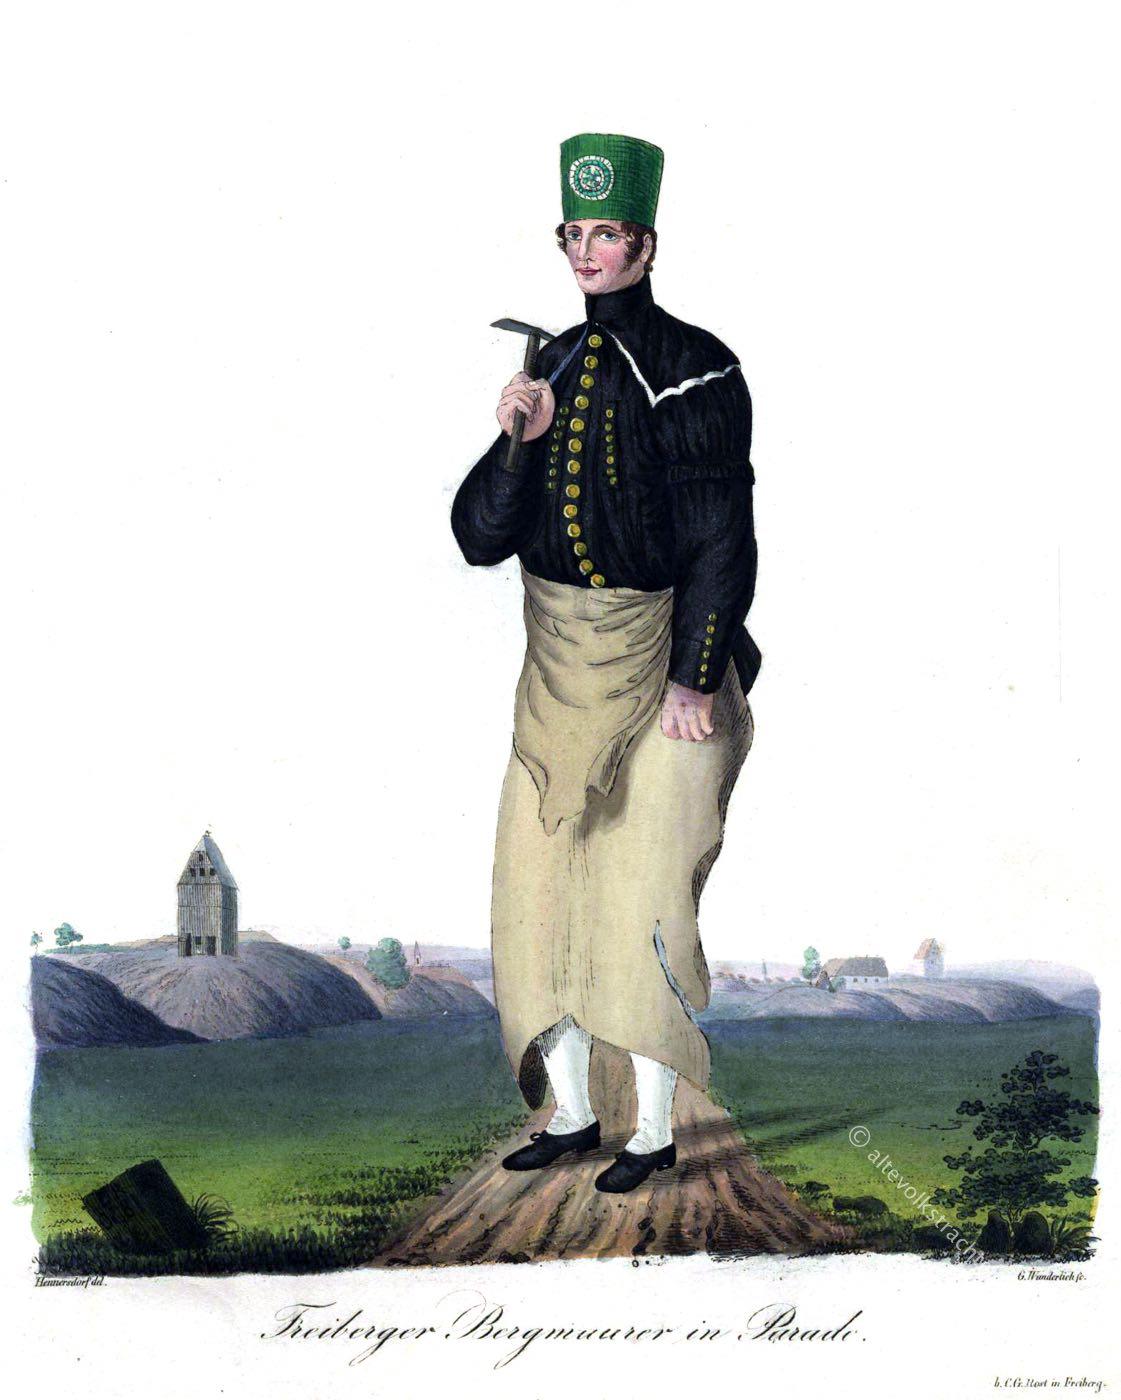 Freiberg, Sachsen, Trachten, Bergarbeiter, Bergmann, Hüttenleute, Bergmauerer, Paradetracht